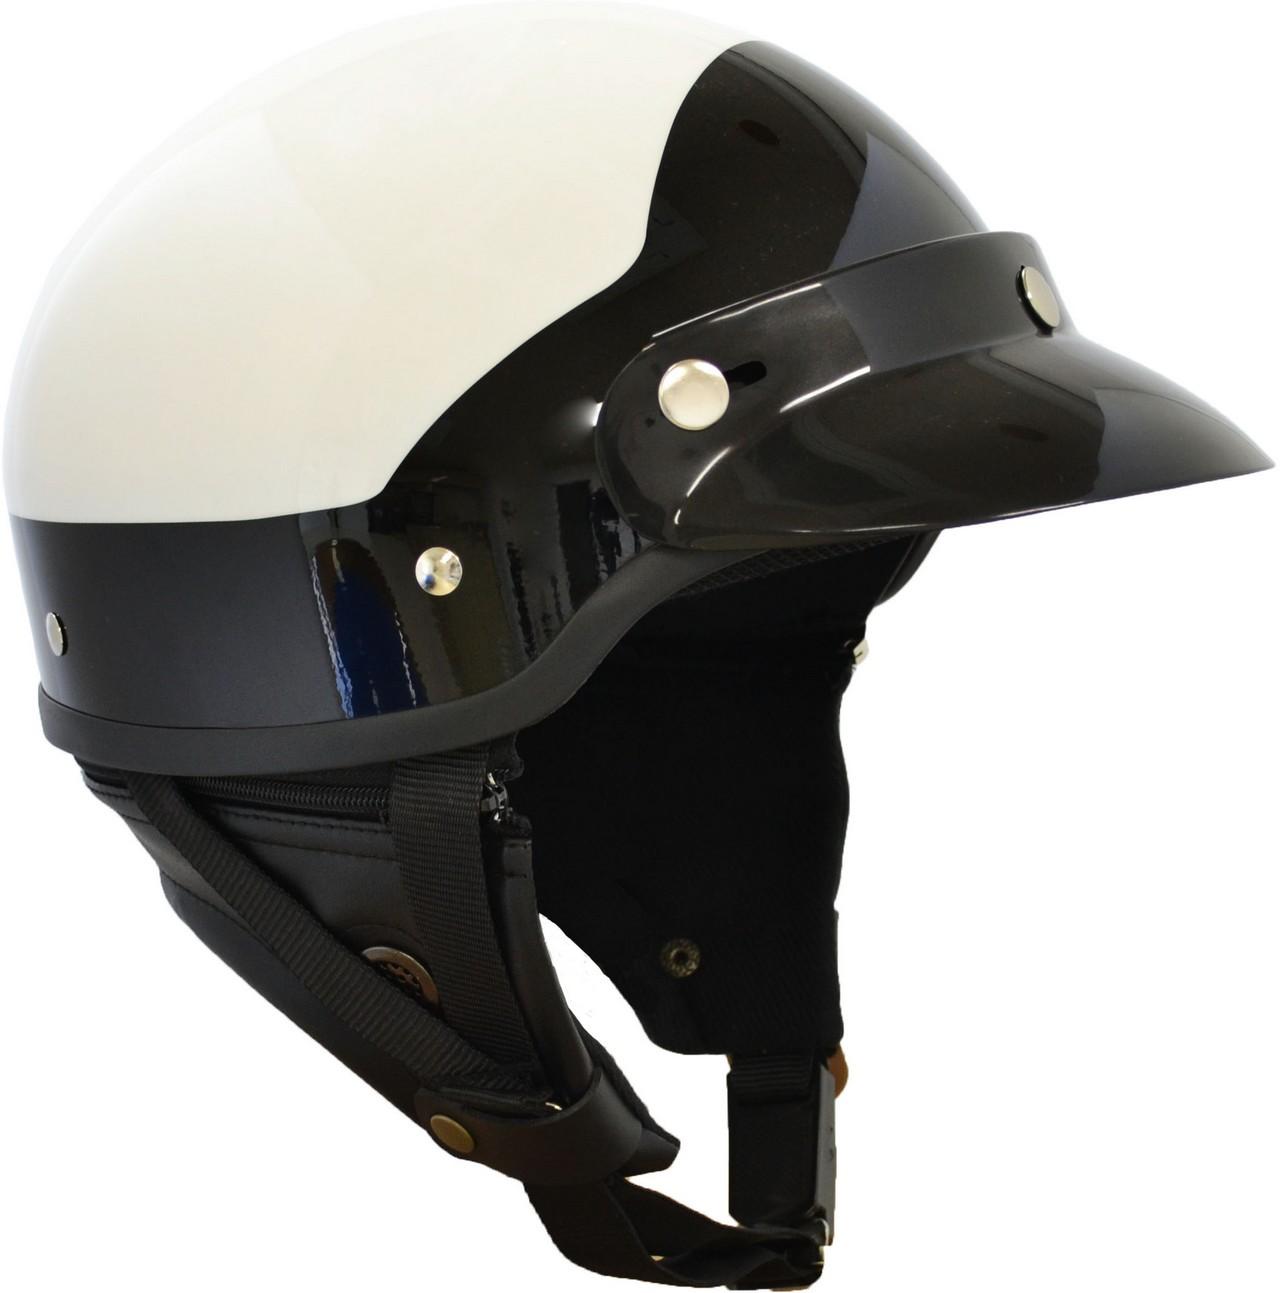 MP-110 Police Style Helmet